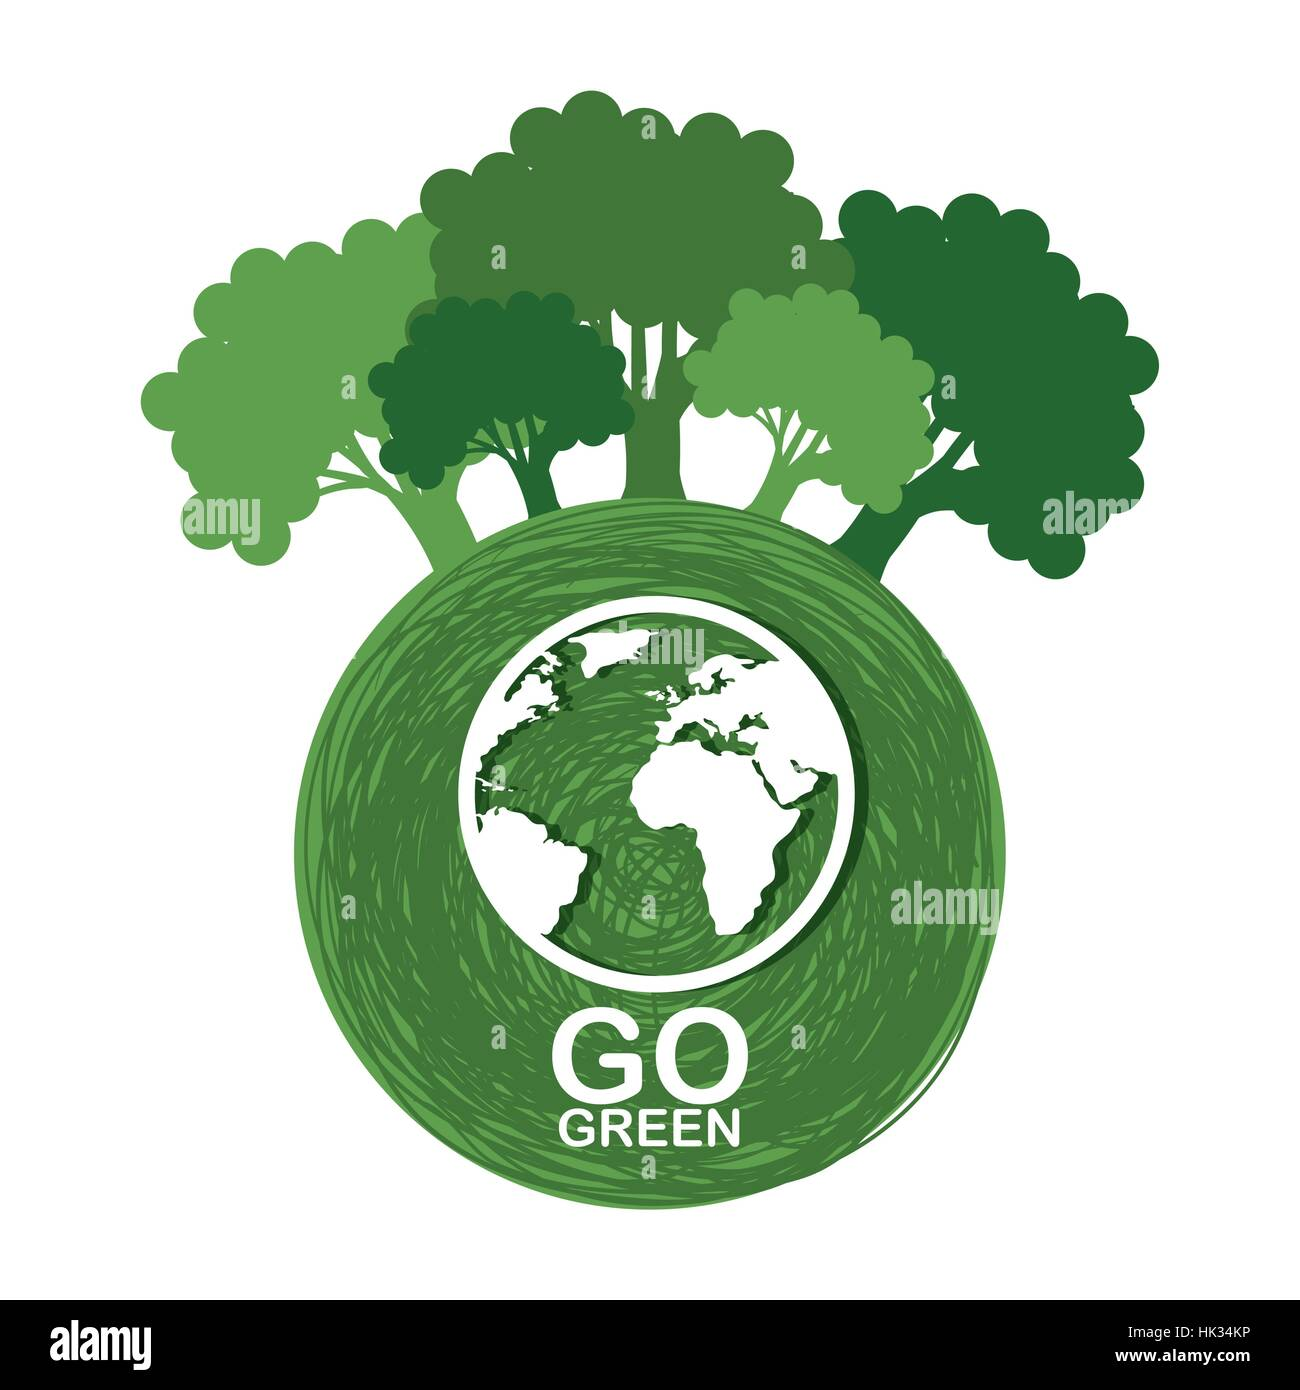 Go Green Ecology Poster Vector Illustration Design Stock Vector Art